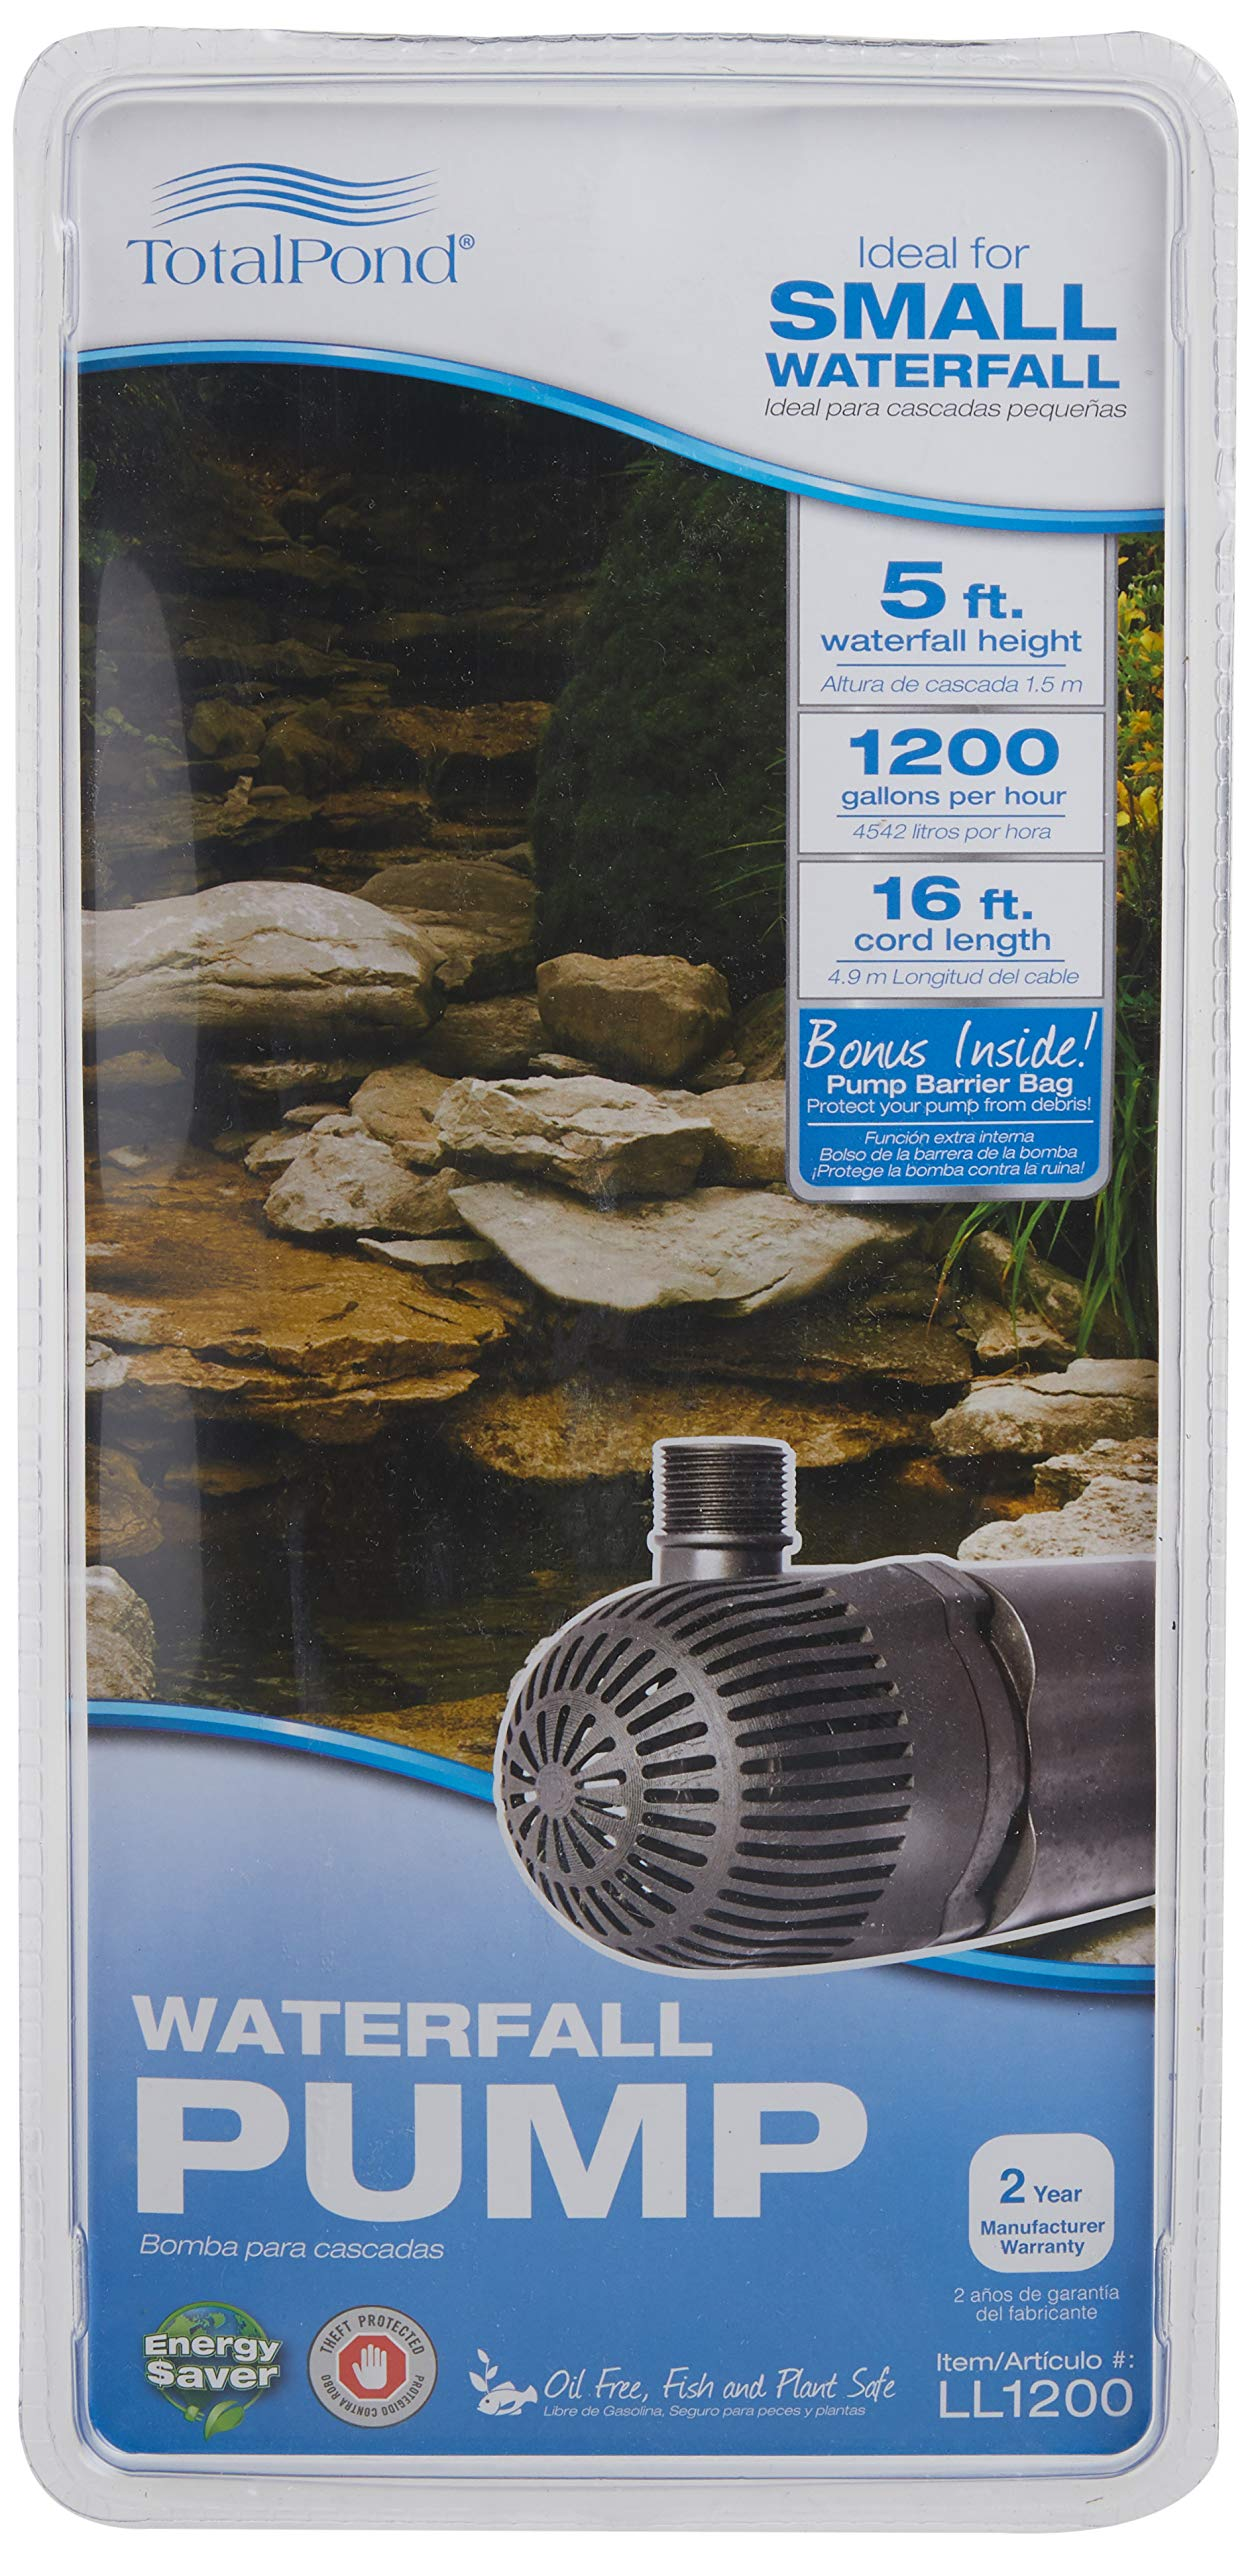 TotalPond 1200 GPH Waterfall Pump